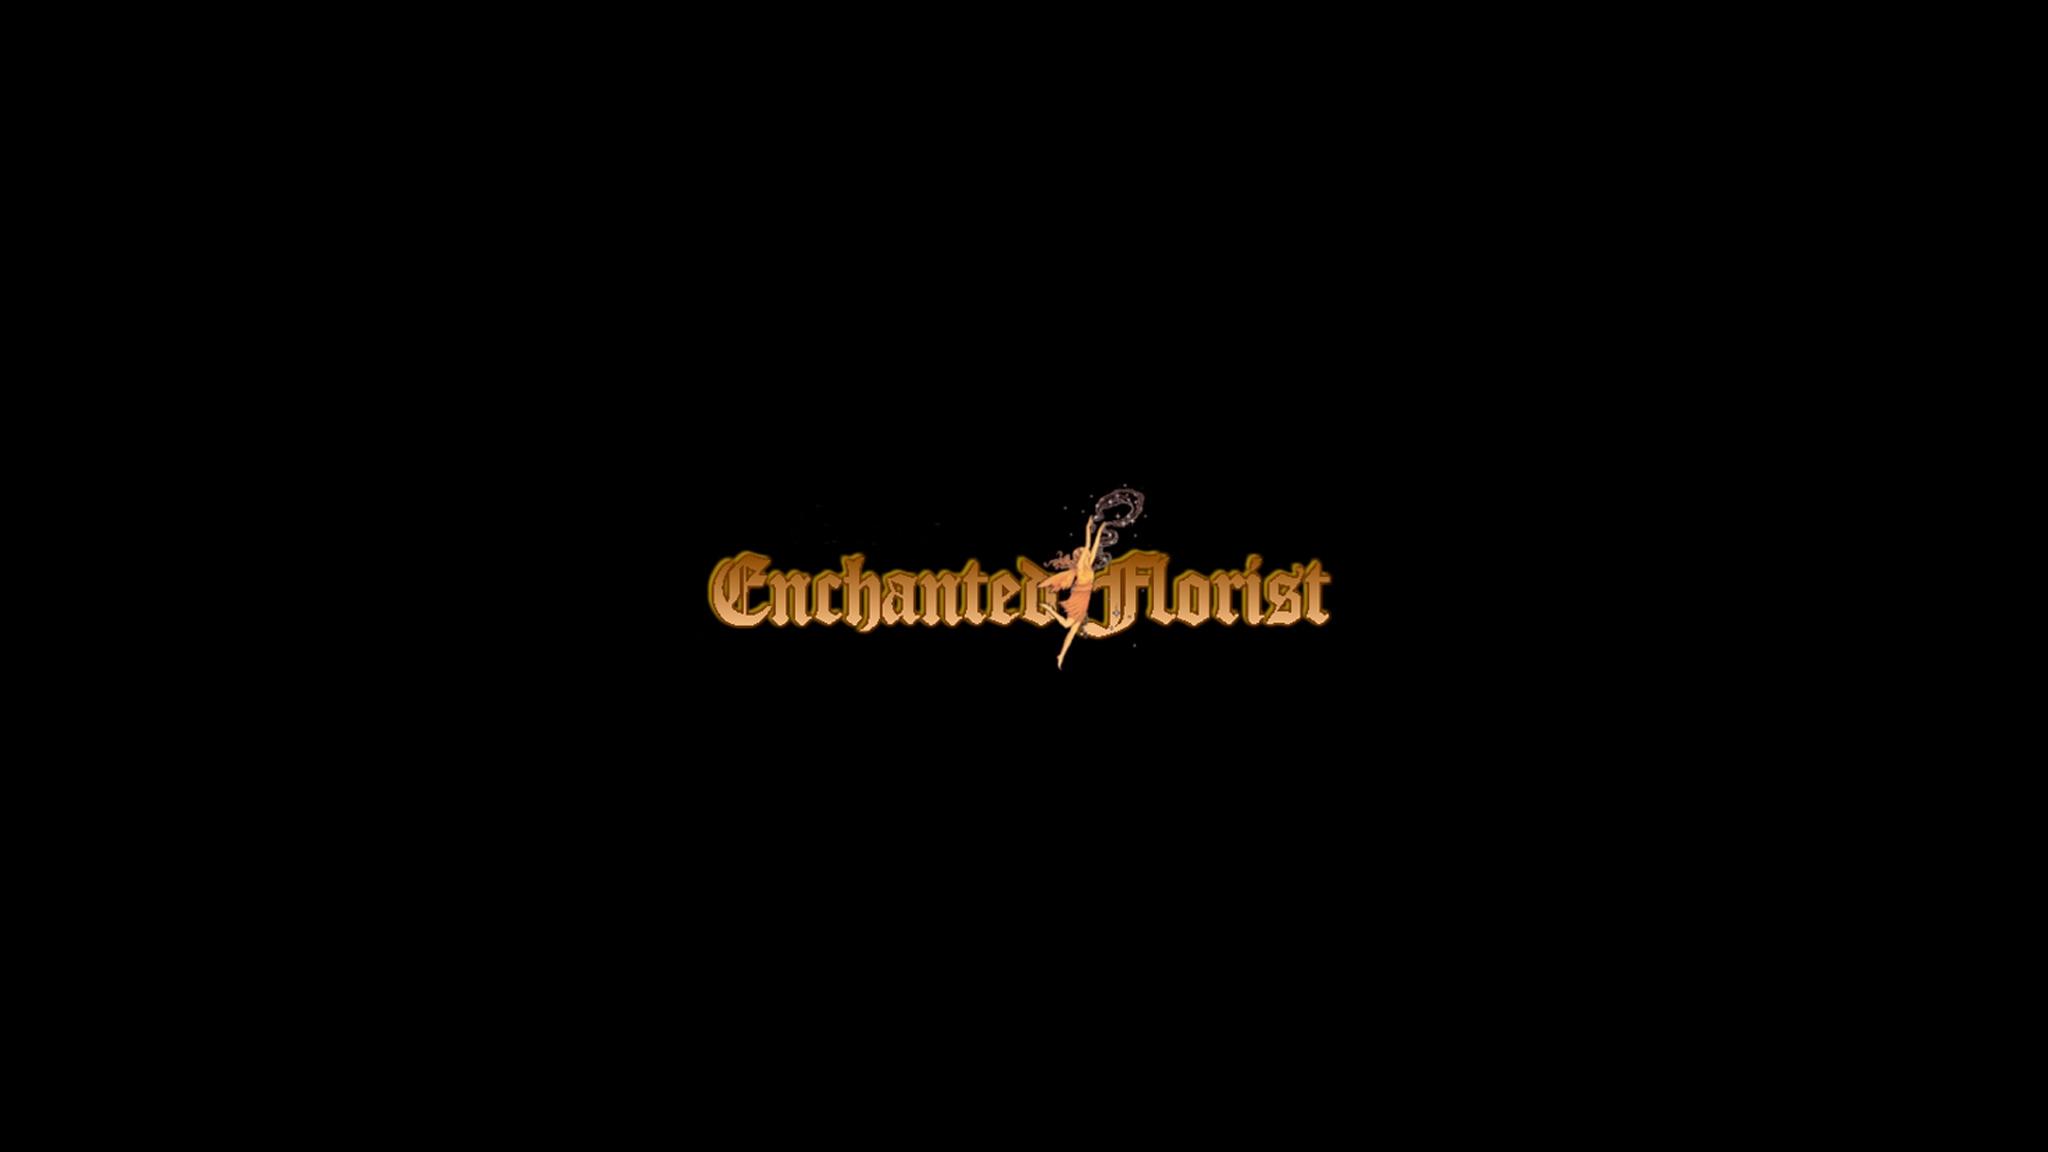 Enchanted-AZ (@enchanted-az) Cover Image